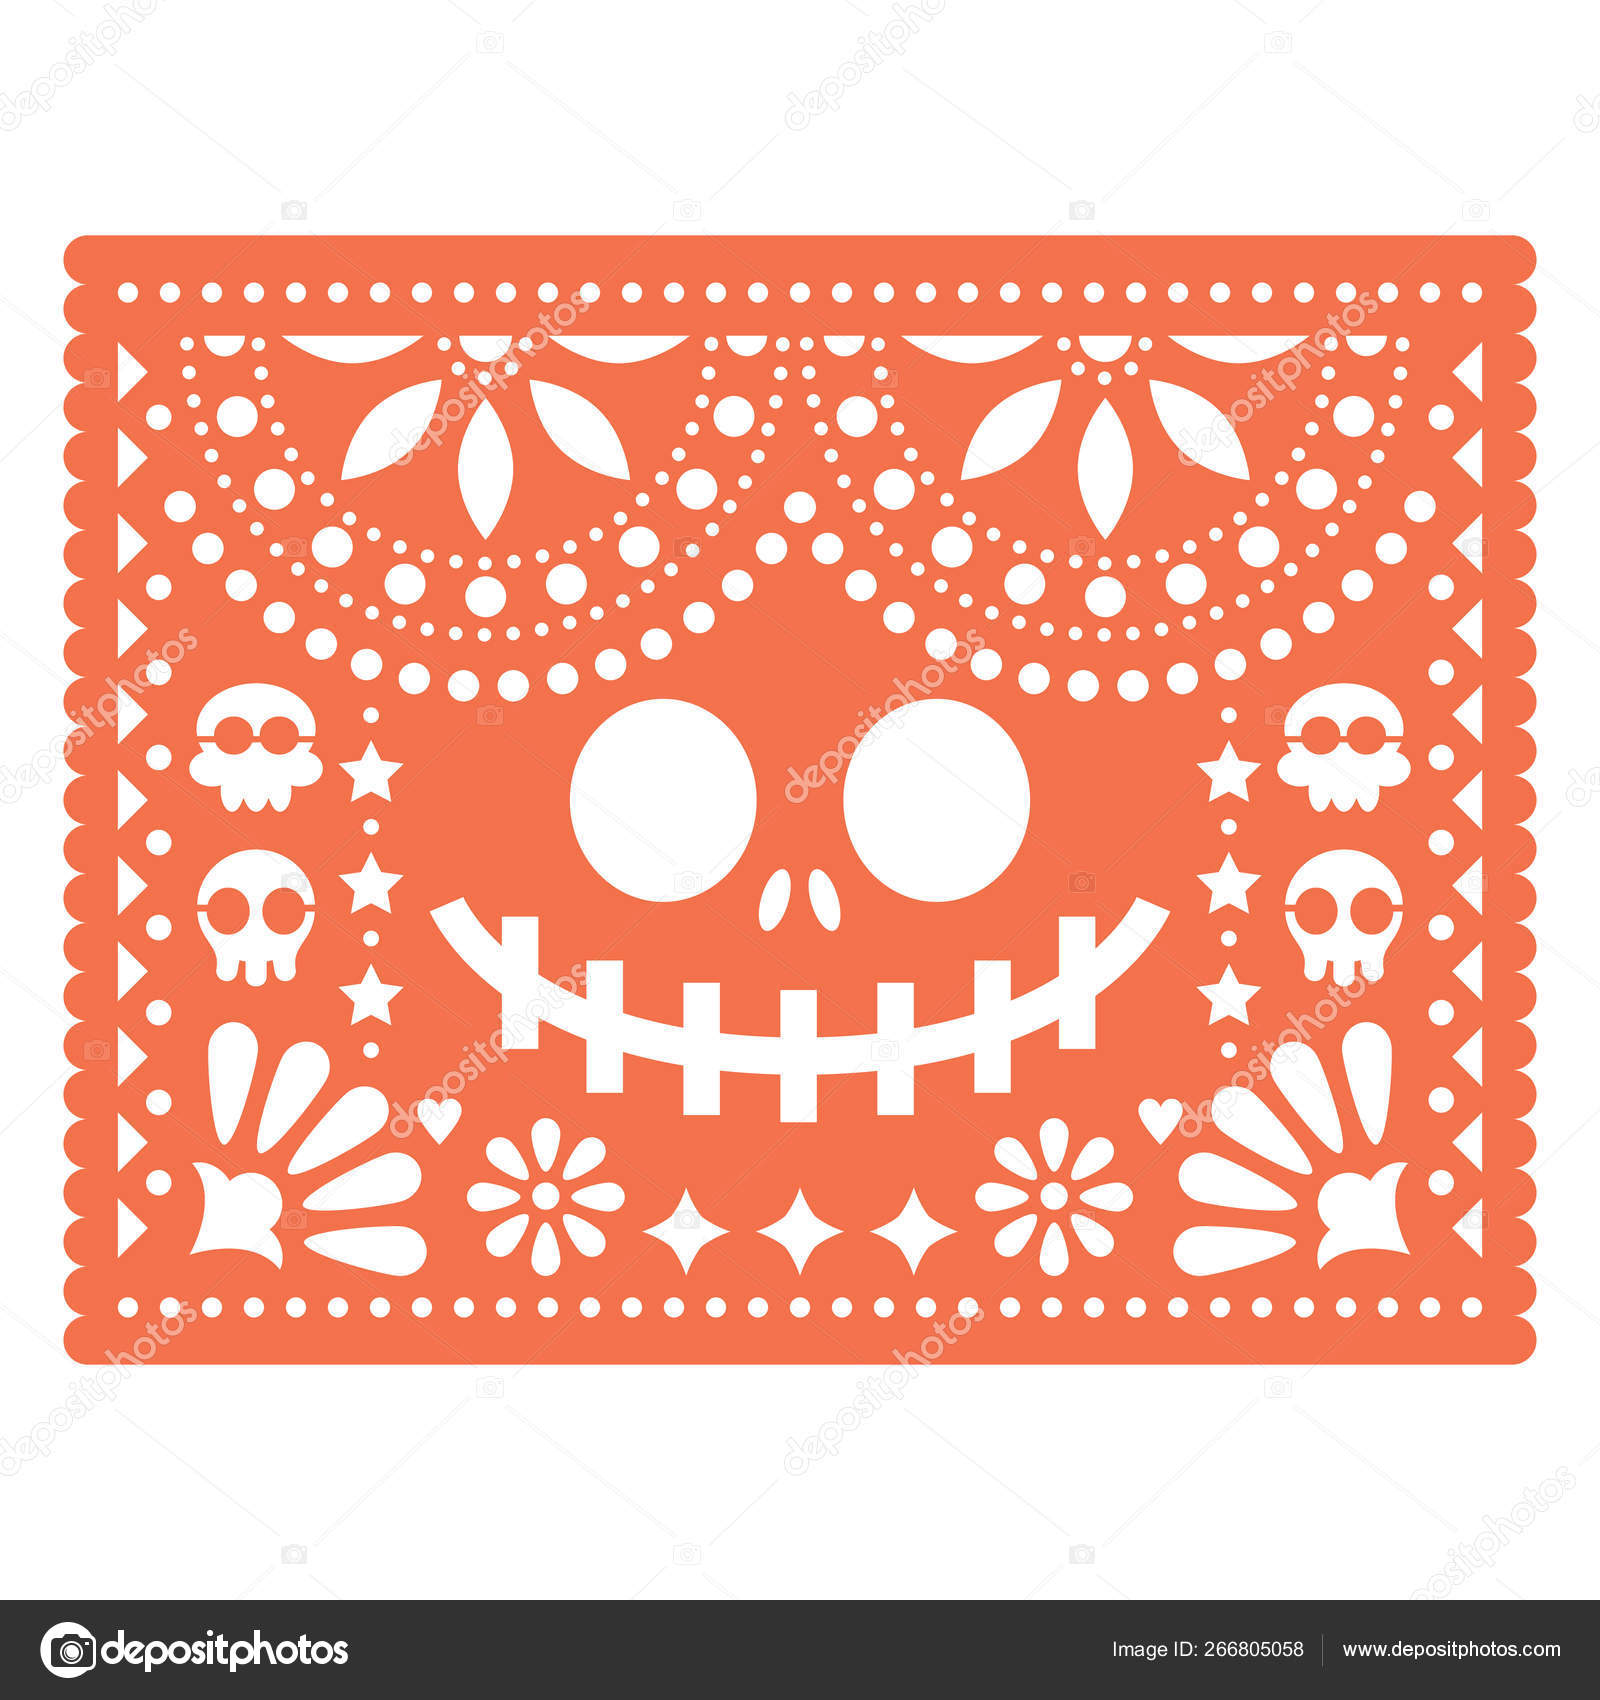 cbf2f9d931a Halloween Papel Picado Design Skulls Pumpkin Scary Face Mexican ...